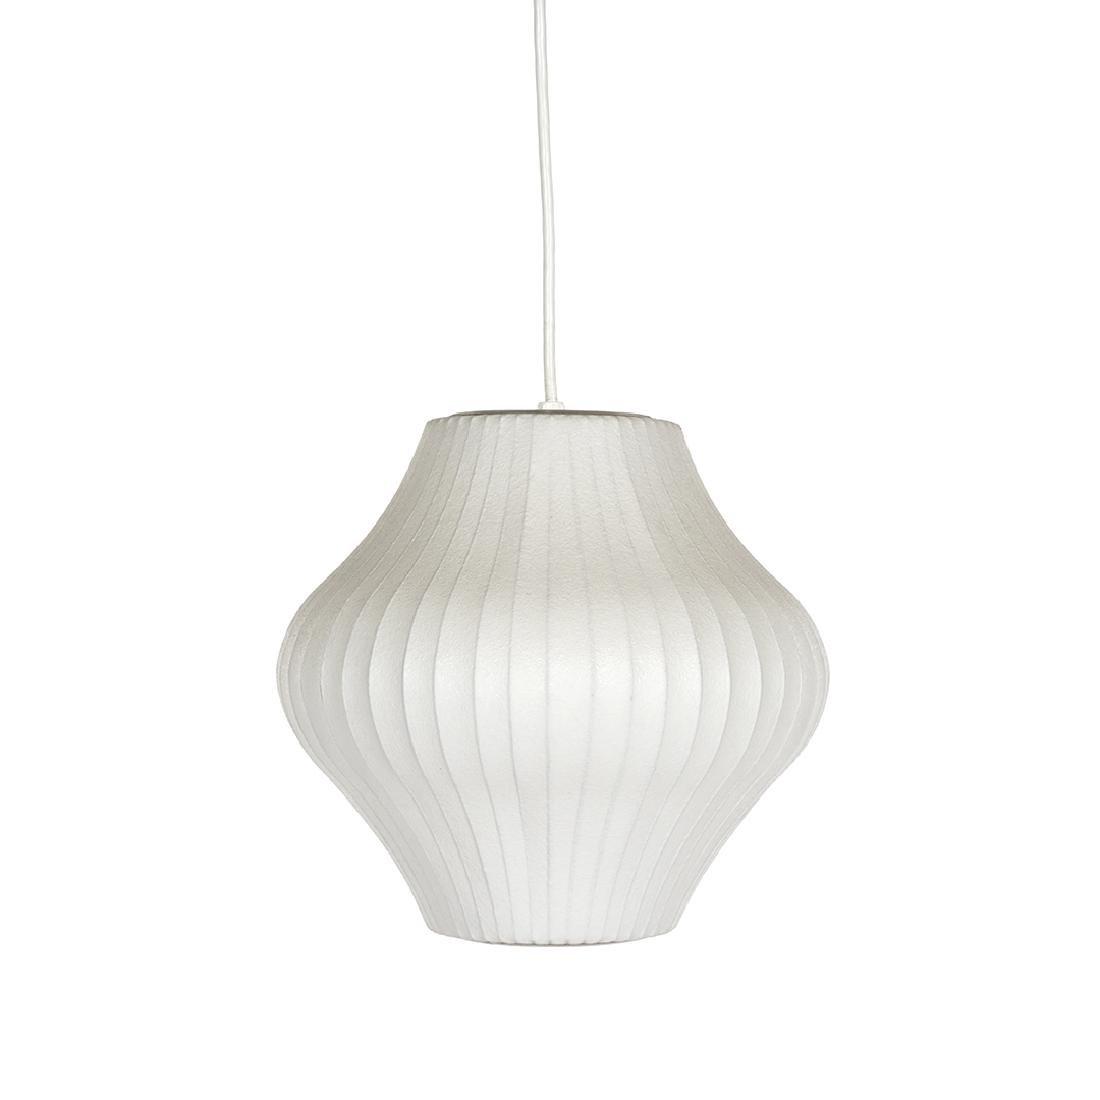 George Nelson Bubble Lamps (3) - 2